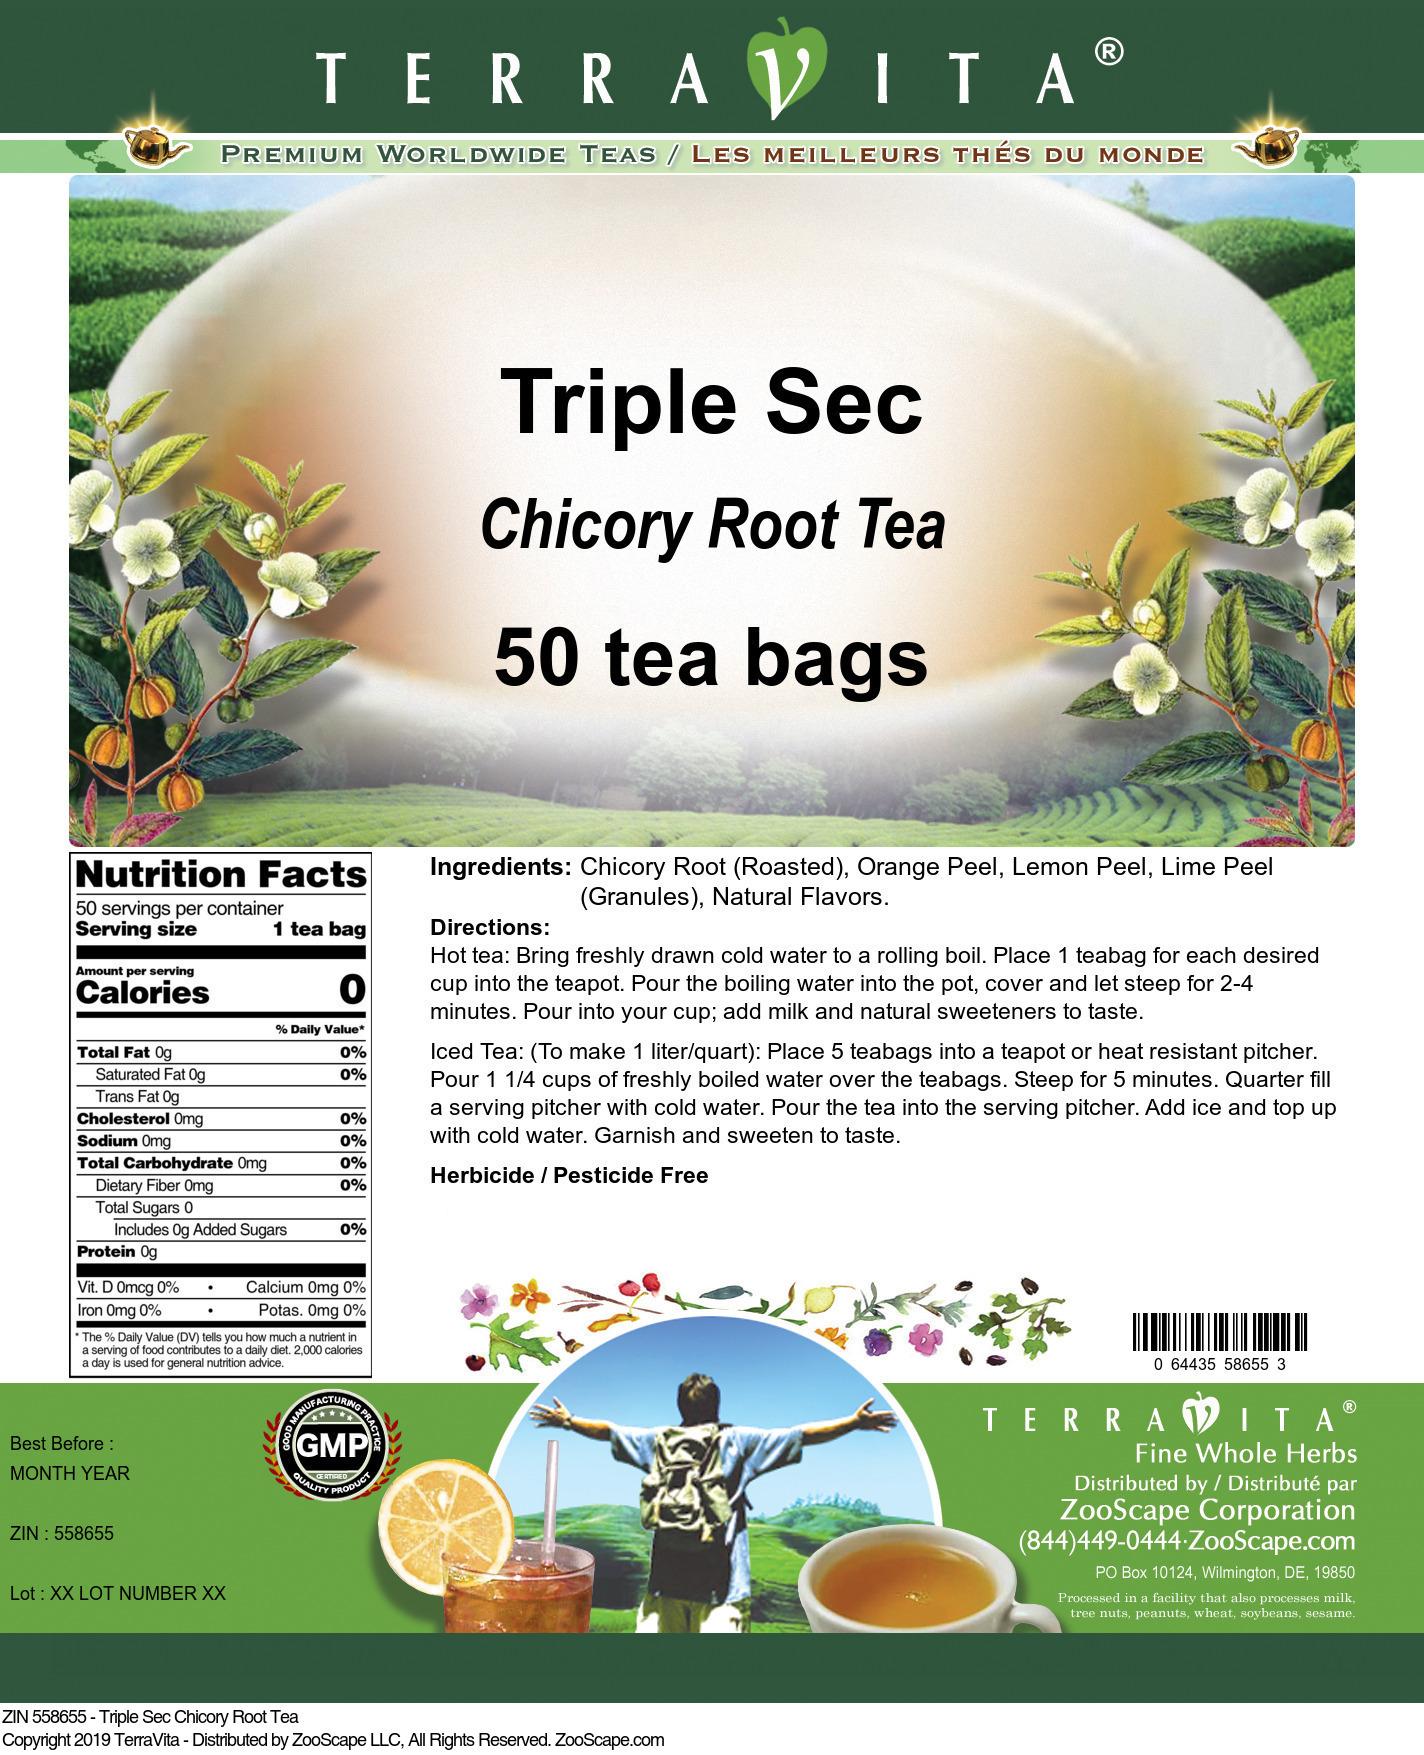 Triple Sec Chicory Root Tea